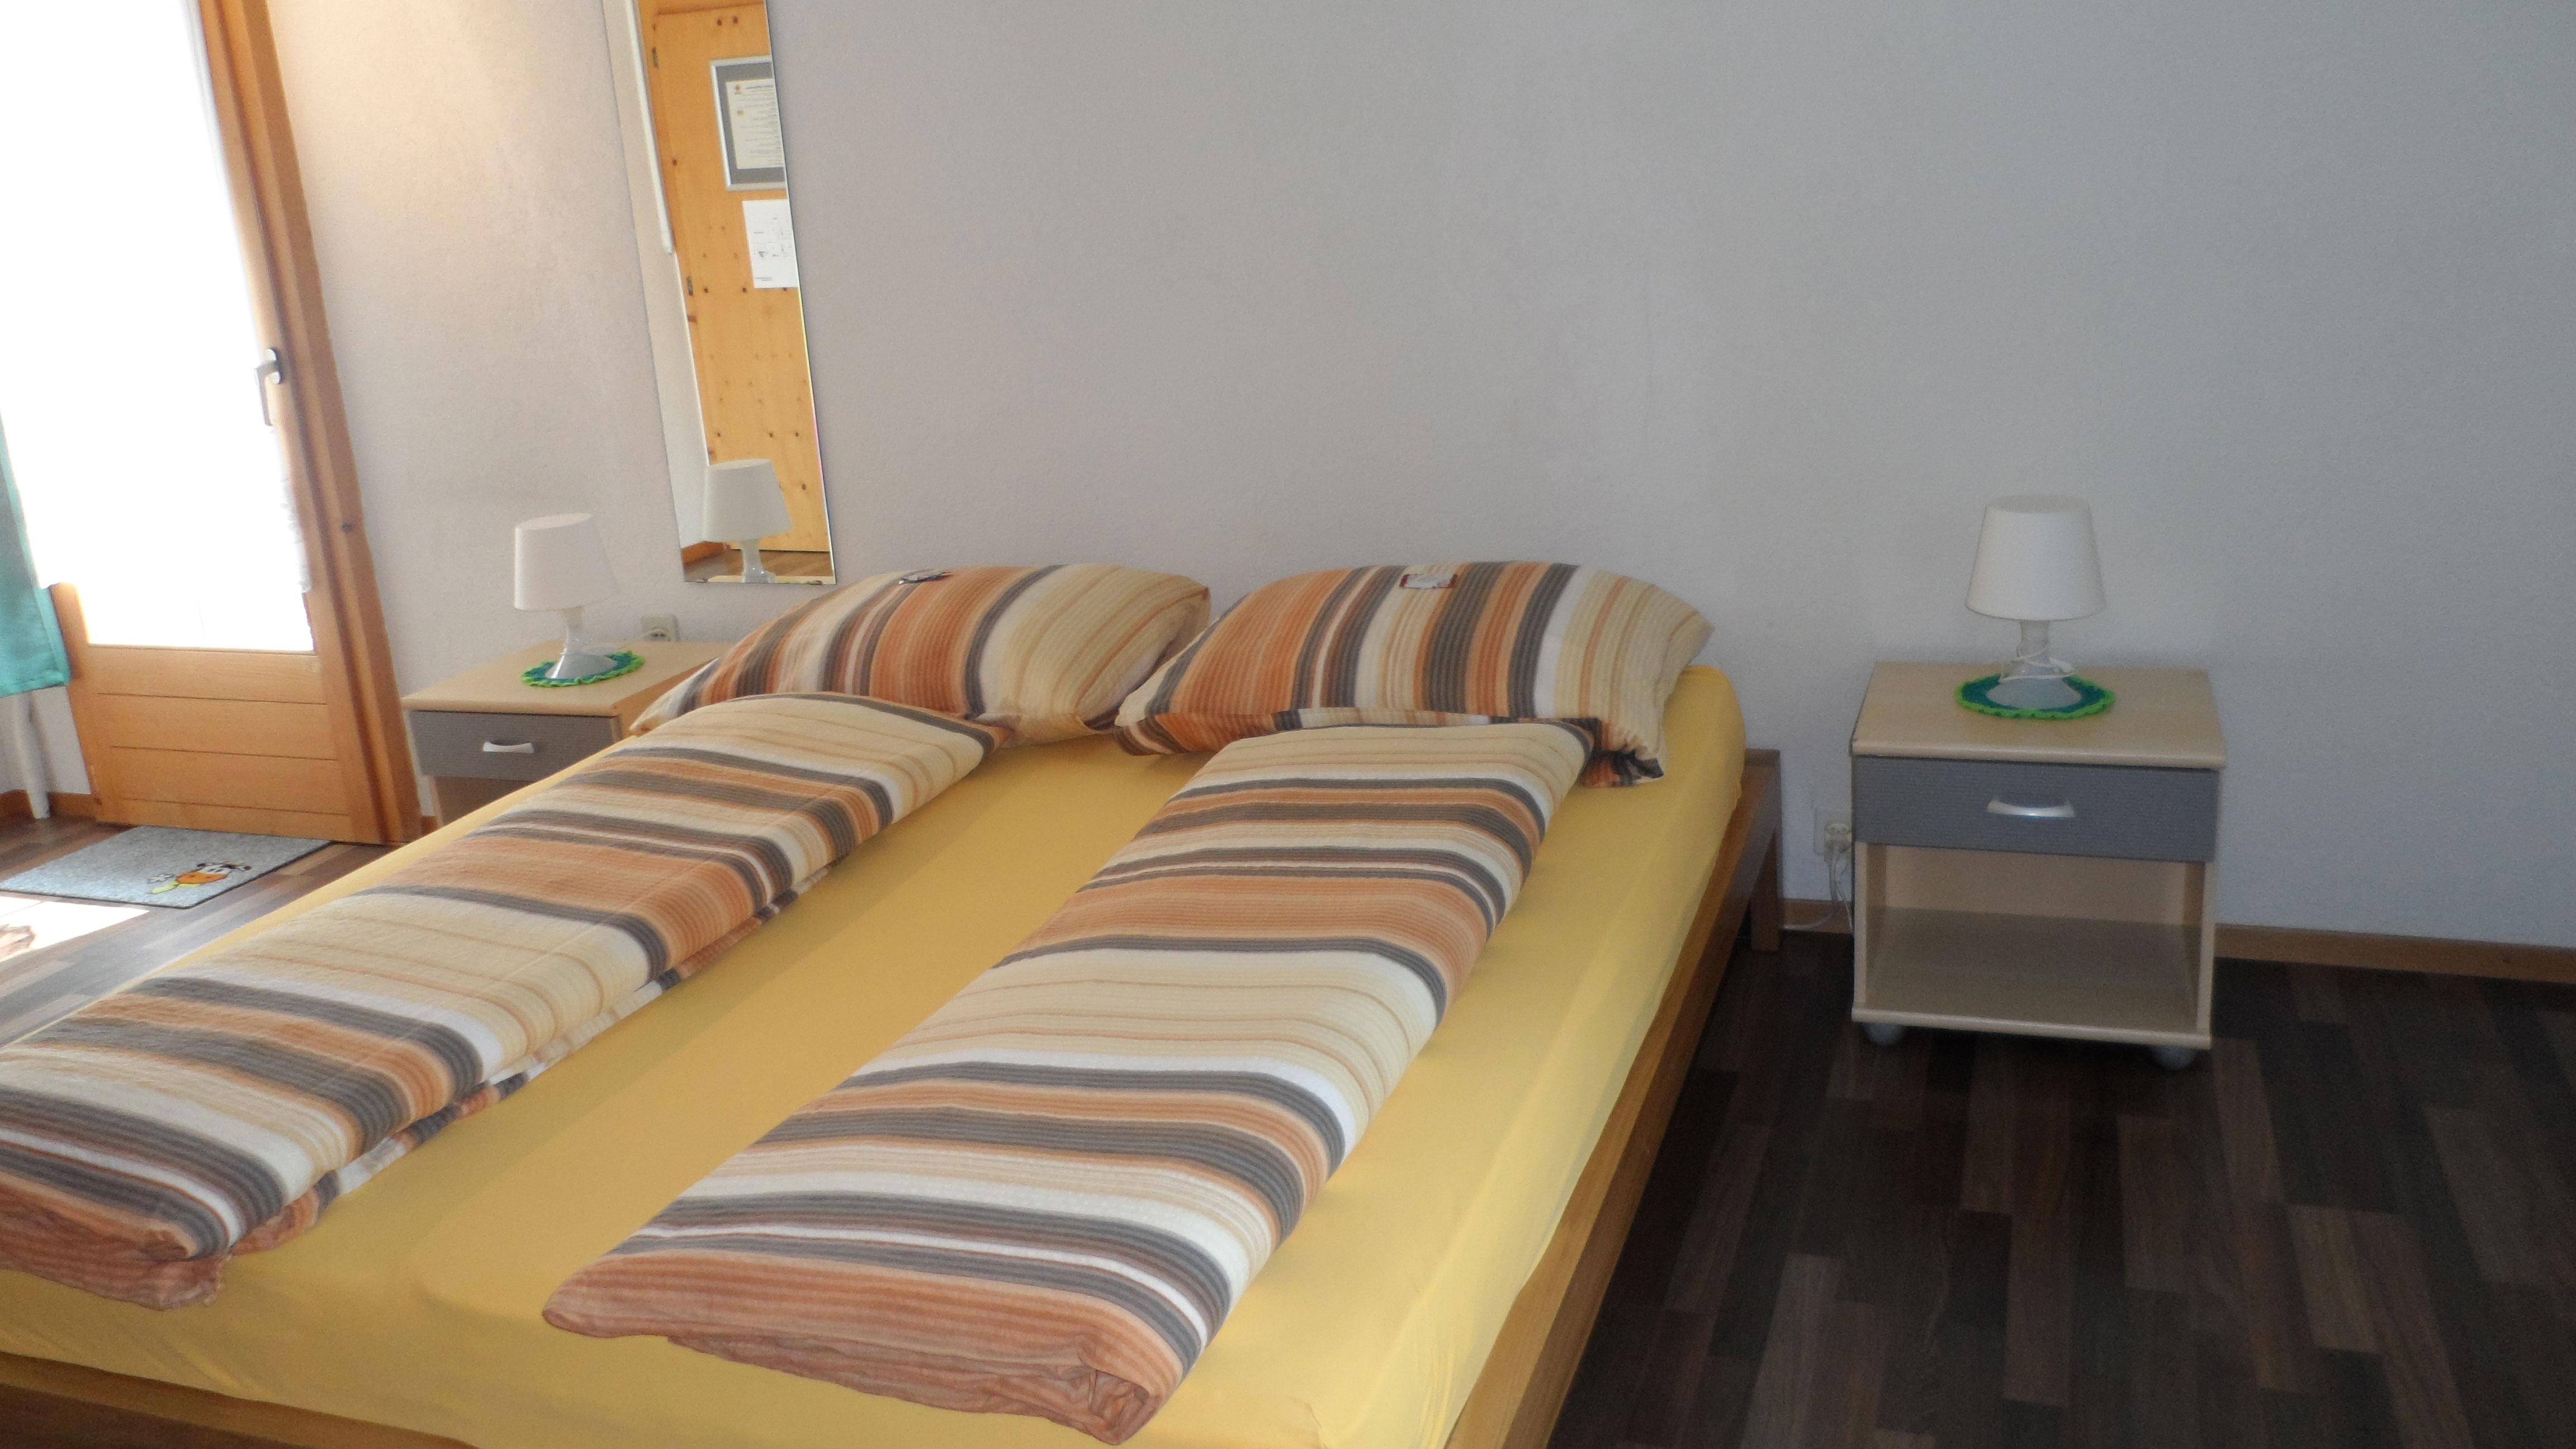 Doppelzimmer im Budgethotel Bernahof - günstige Zimmer